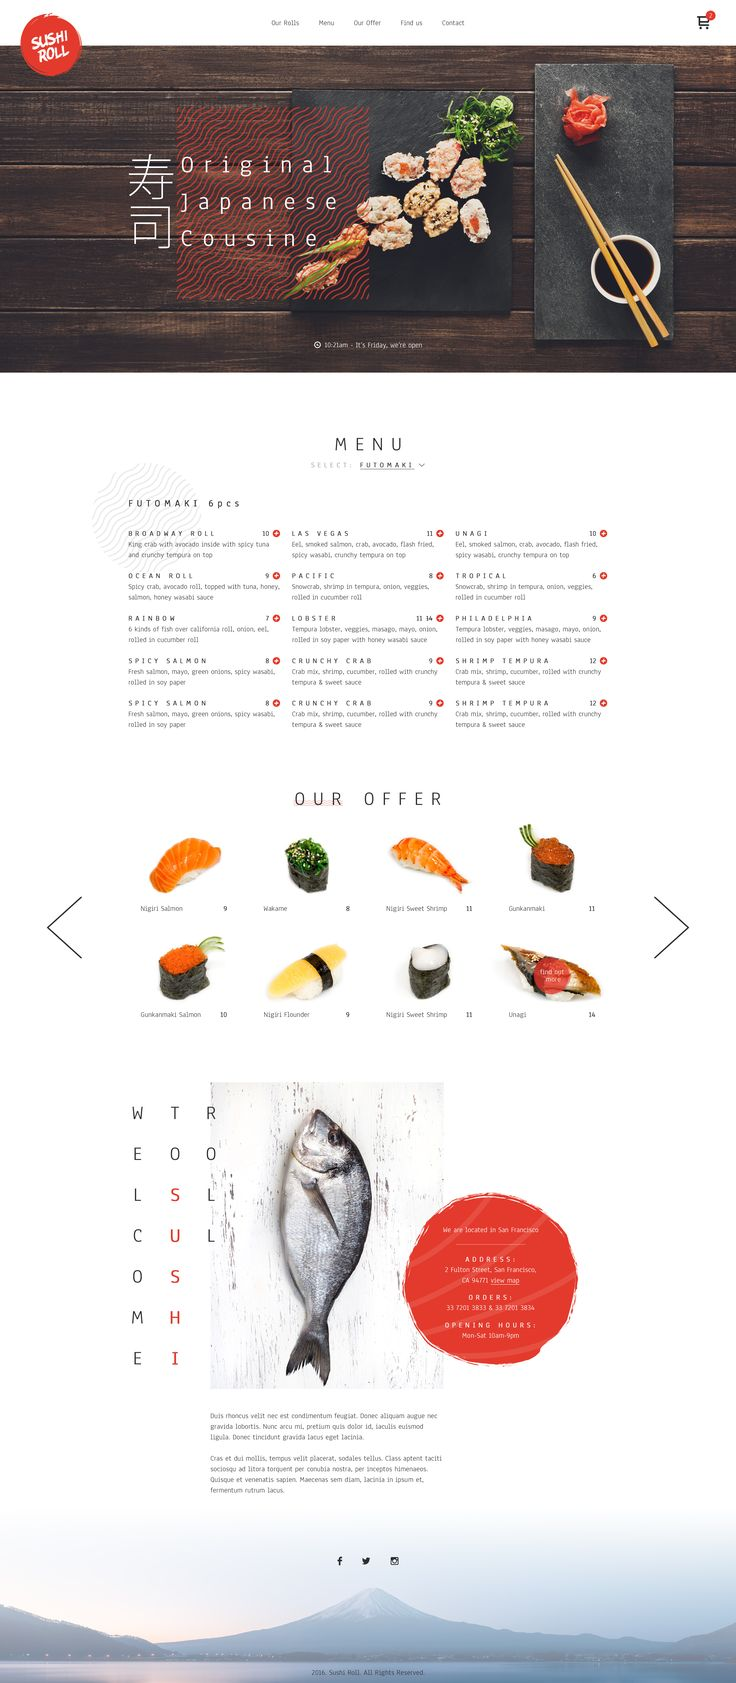 Sushi restaurant by Greg Dlubacz - Dribbble